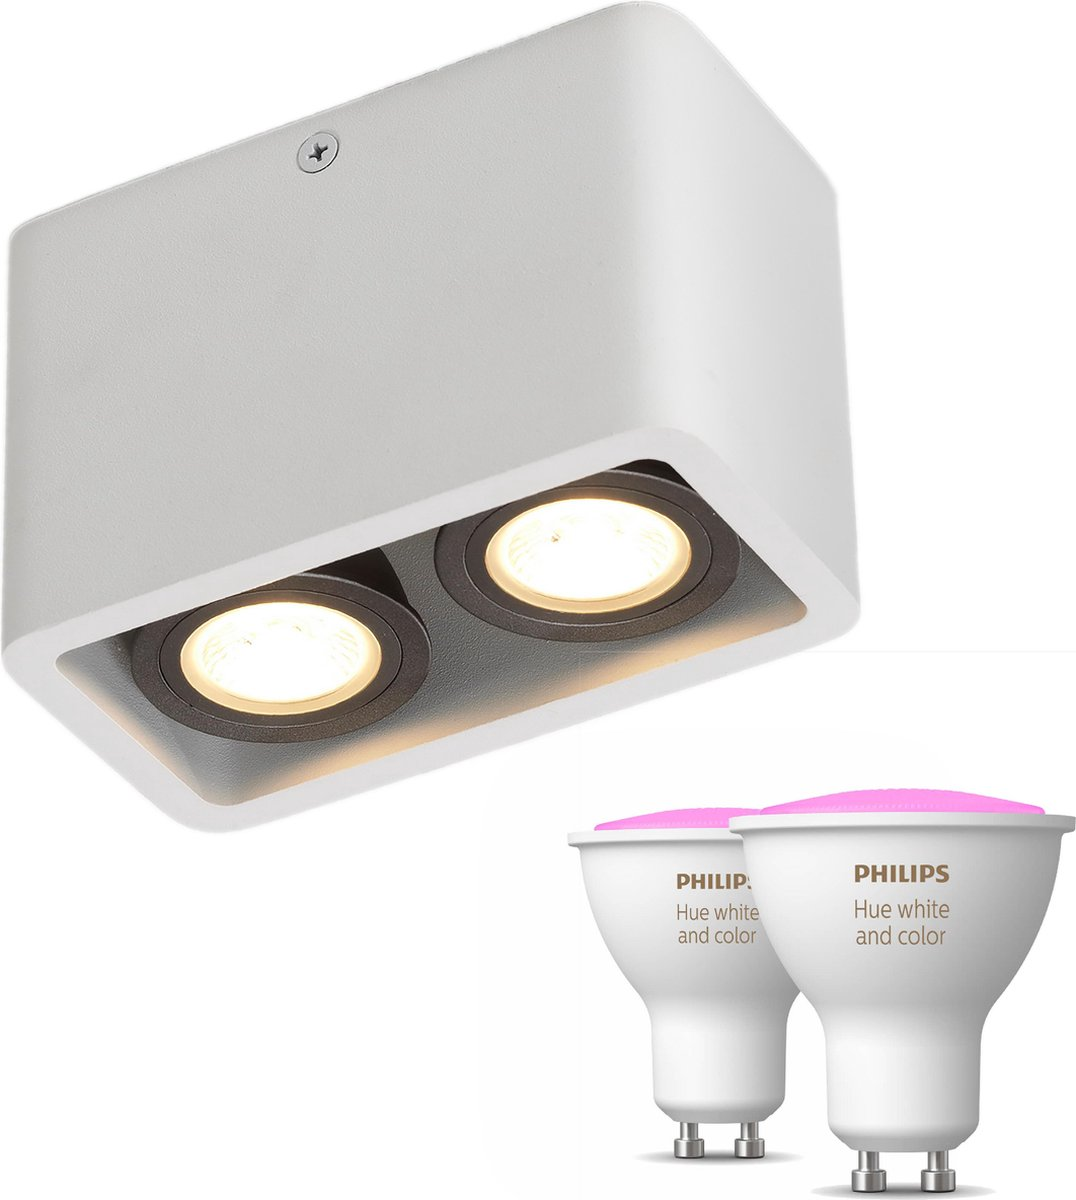 Artedelight Moni opbouwspot - Wit - 2 lichtpunten - Incl. Philips Hue White & Color Ambiance Gu10